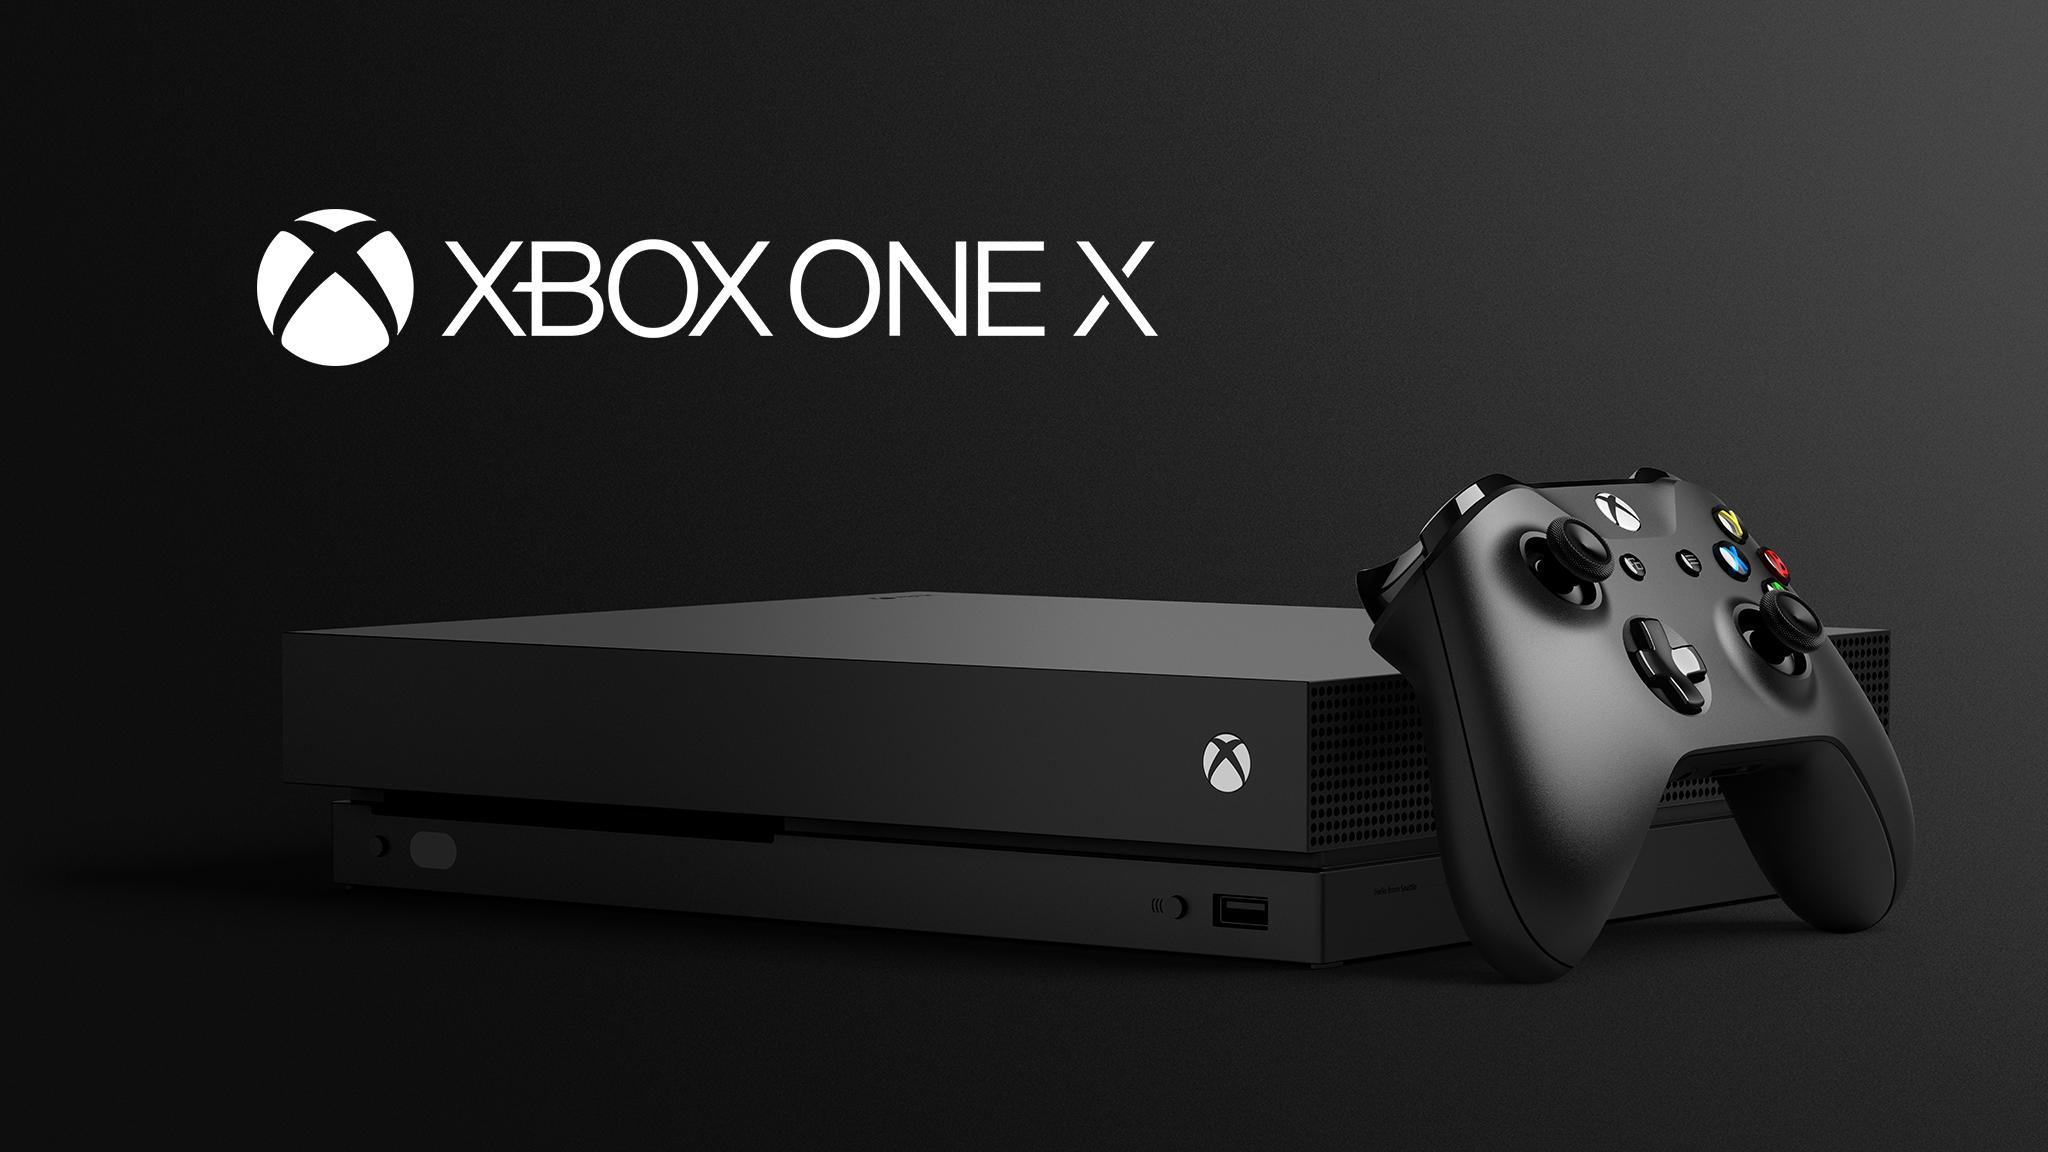 Xbox One X pack shot